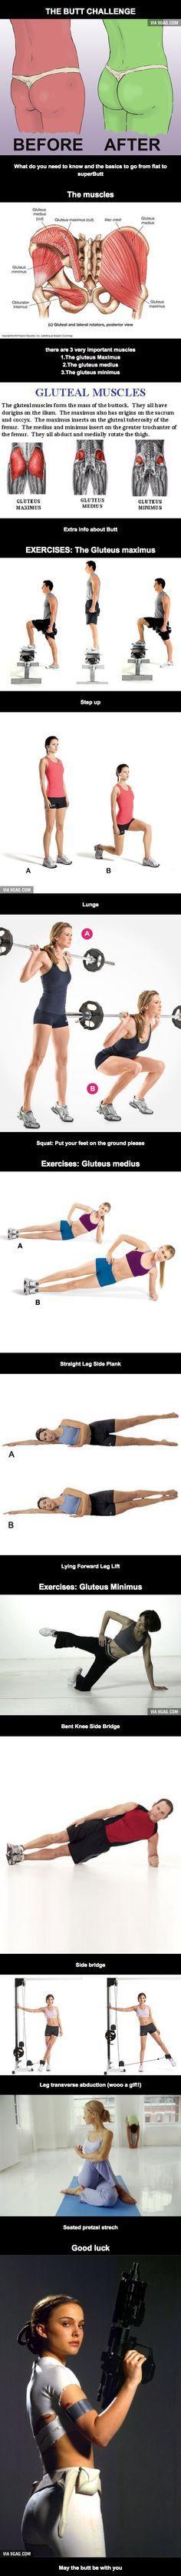 Butt Challenge -- exercises for gluteus maximus, gluteus medius, and gluteus minimus